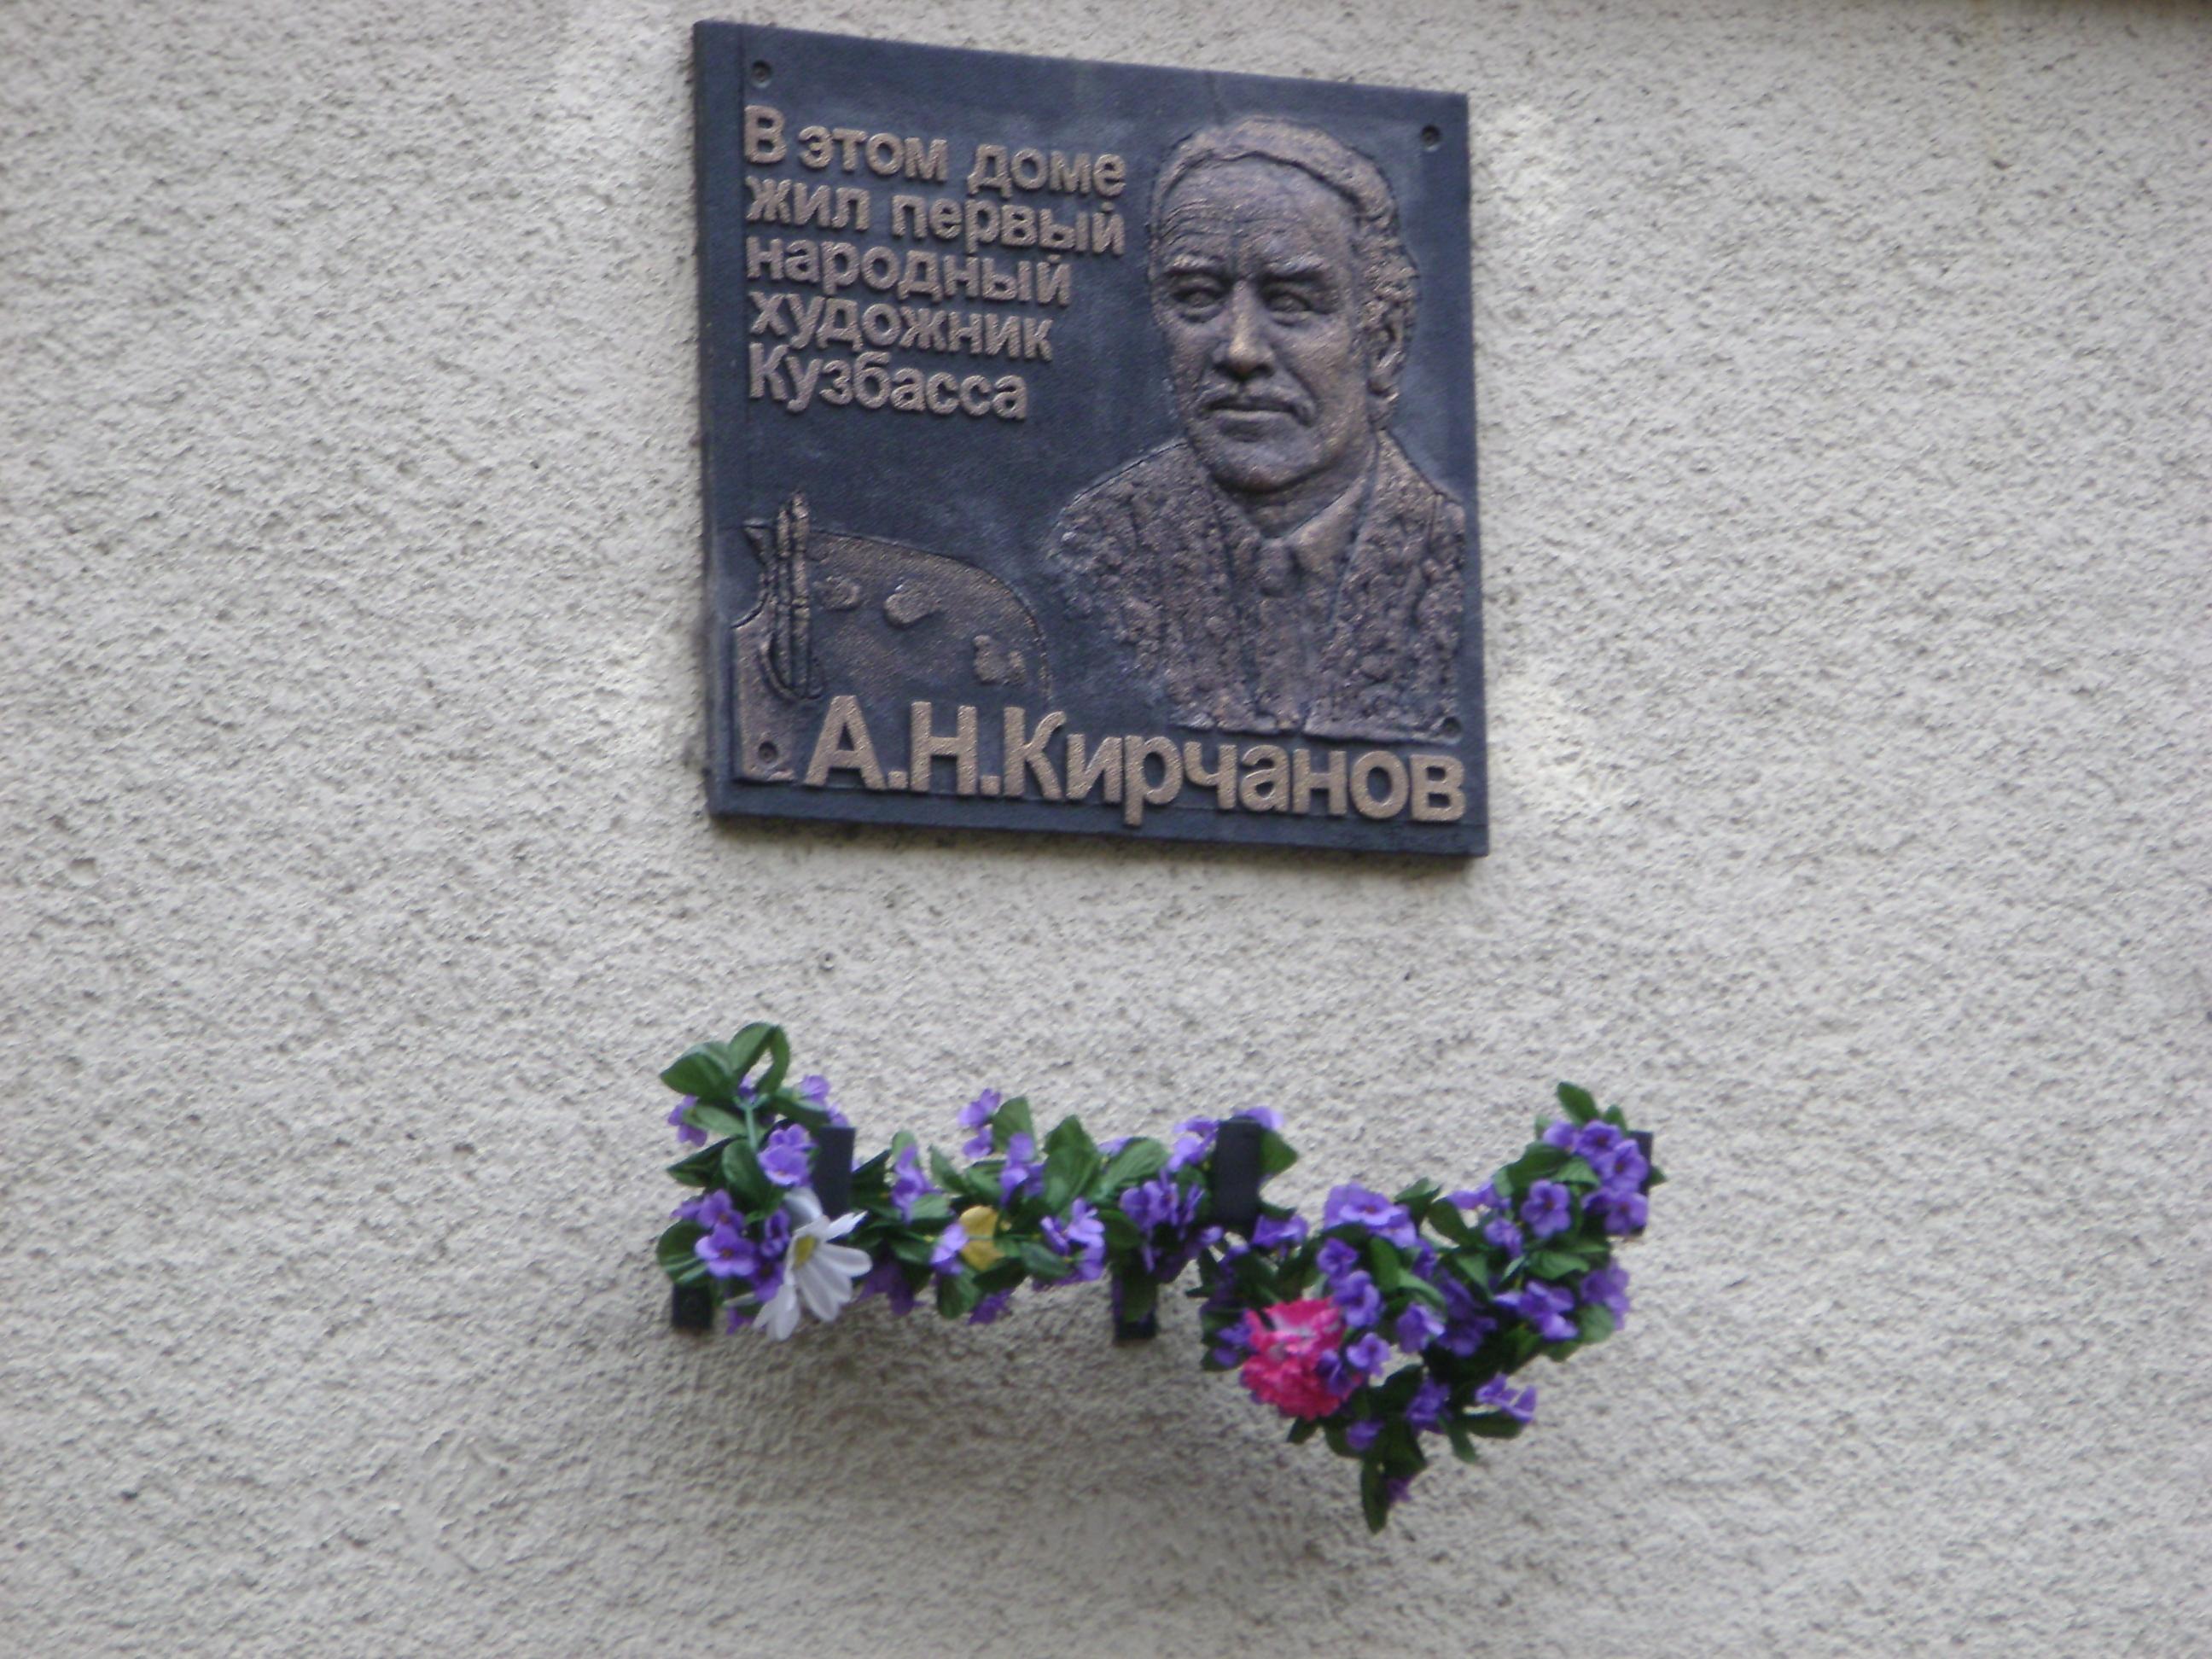 1306923904-Kirchanov-avtor-hmelevsk